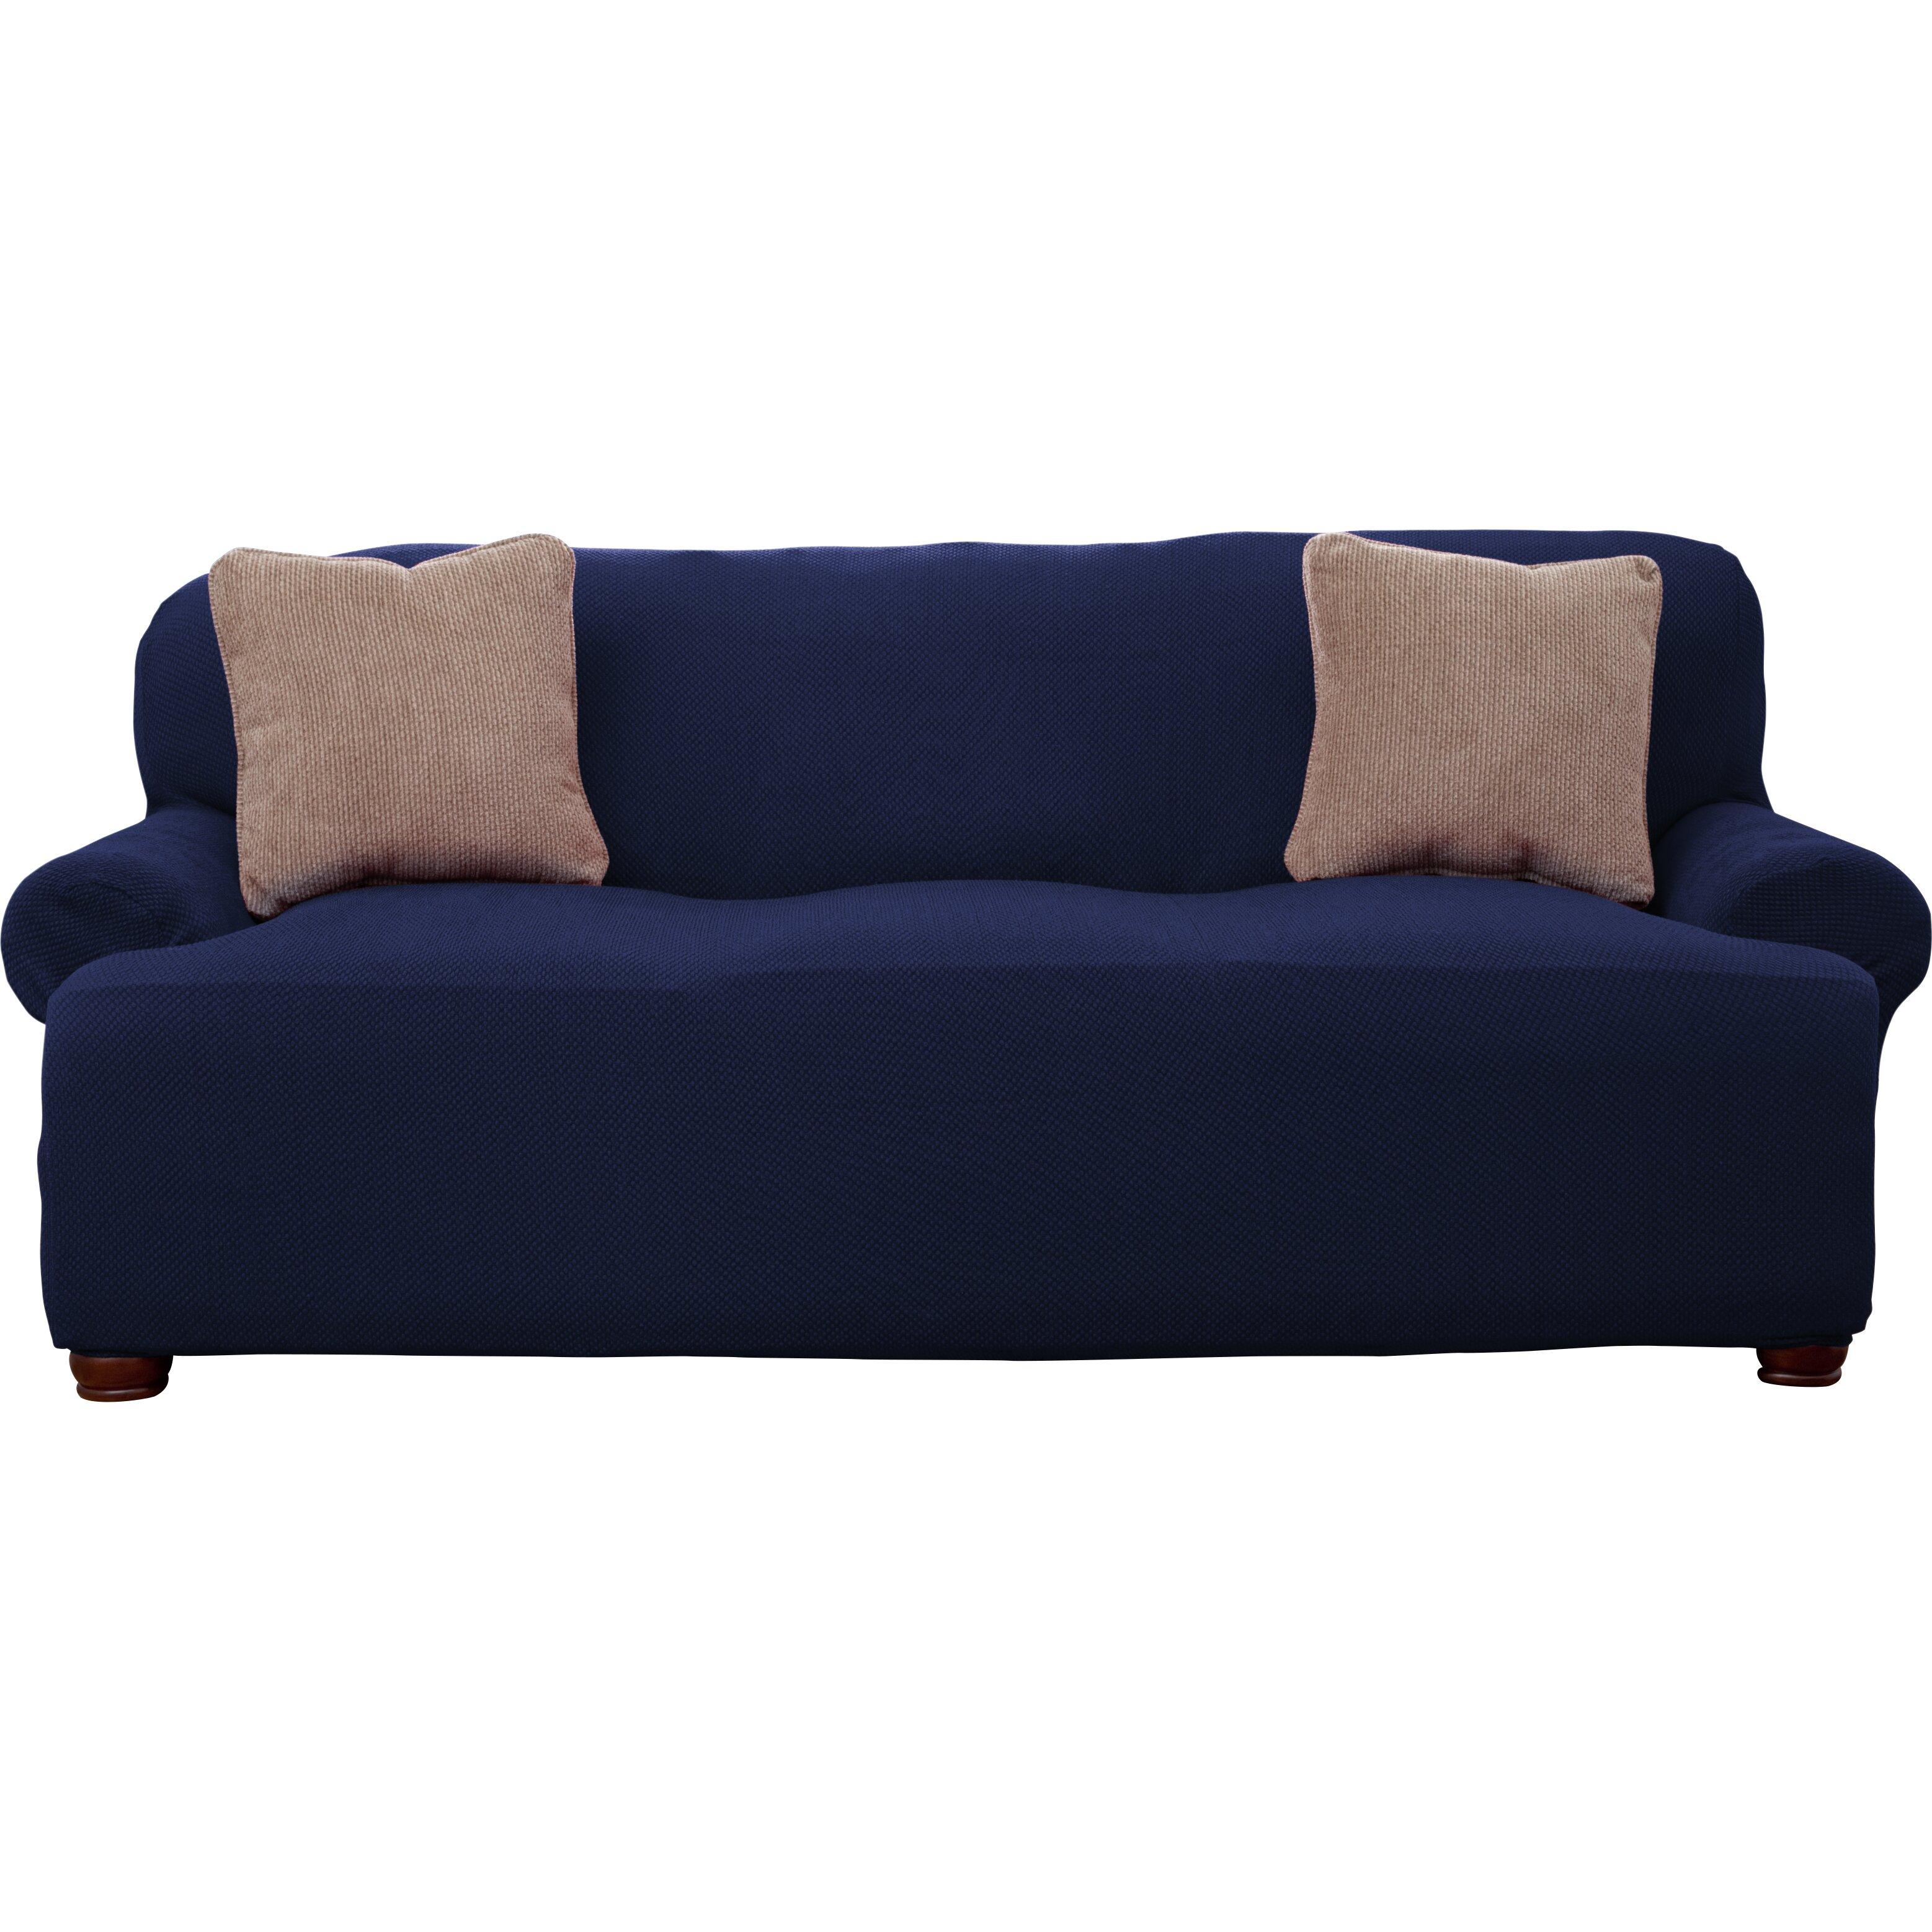 Home Fashion Design Savannah Popcorn Sofa Slipcover